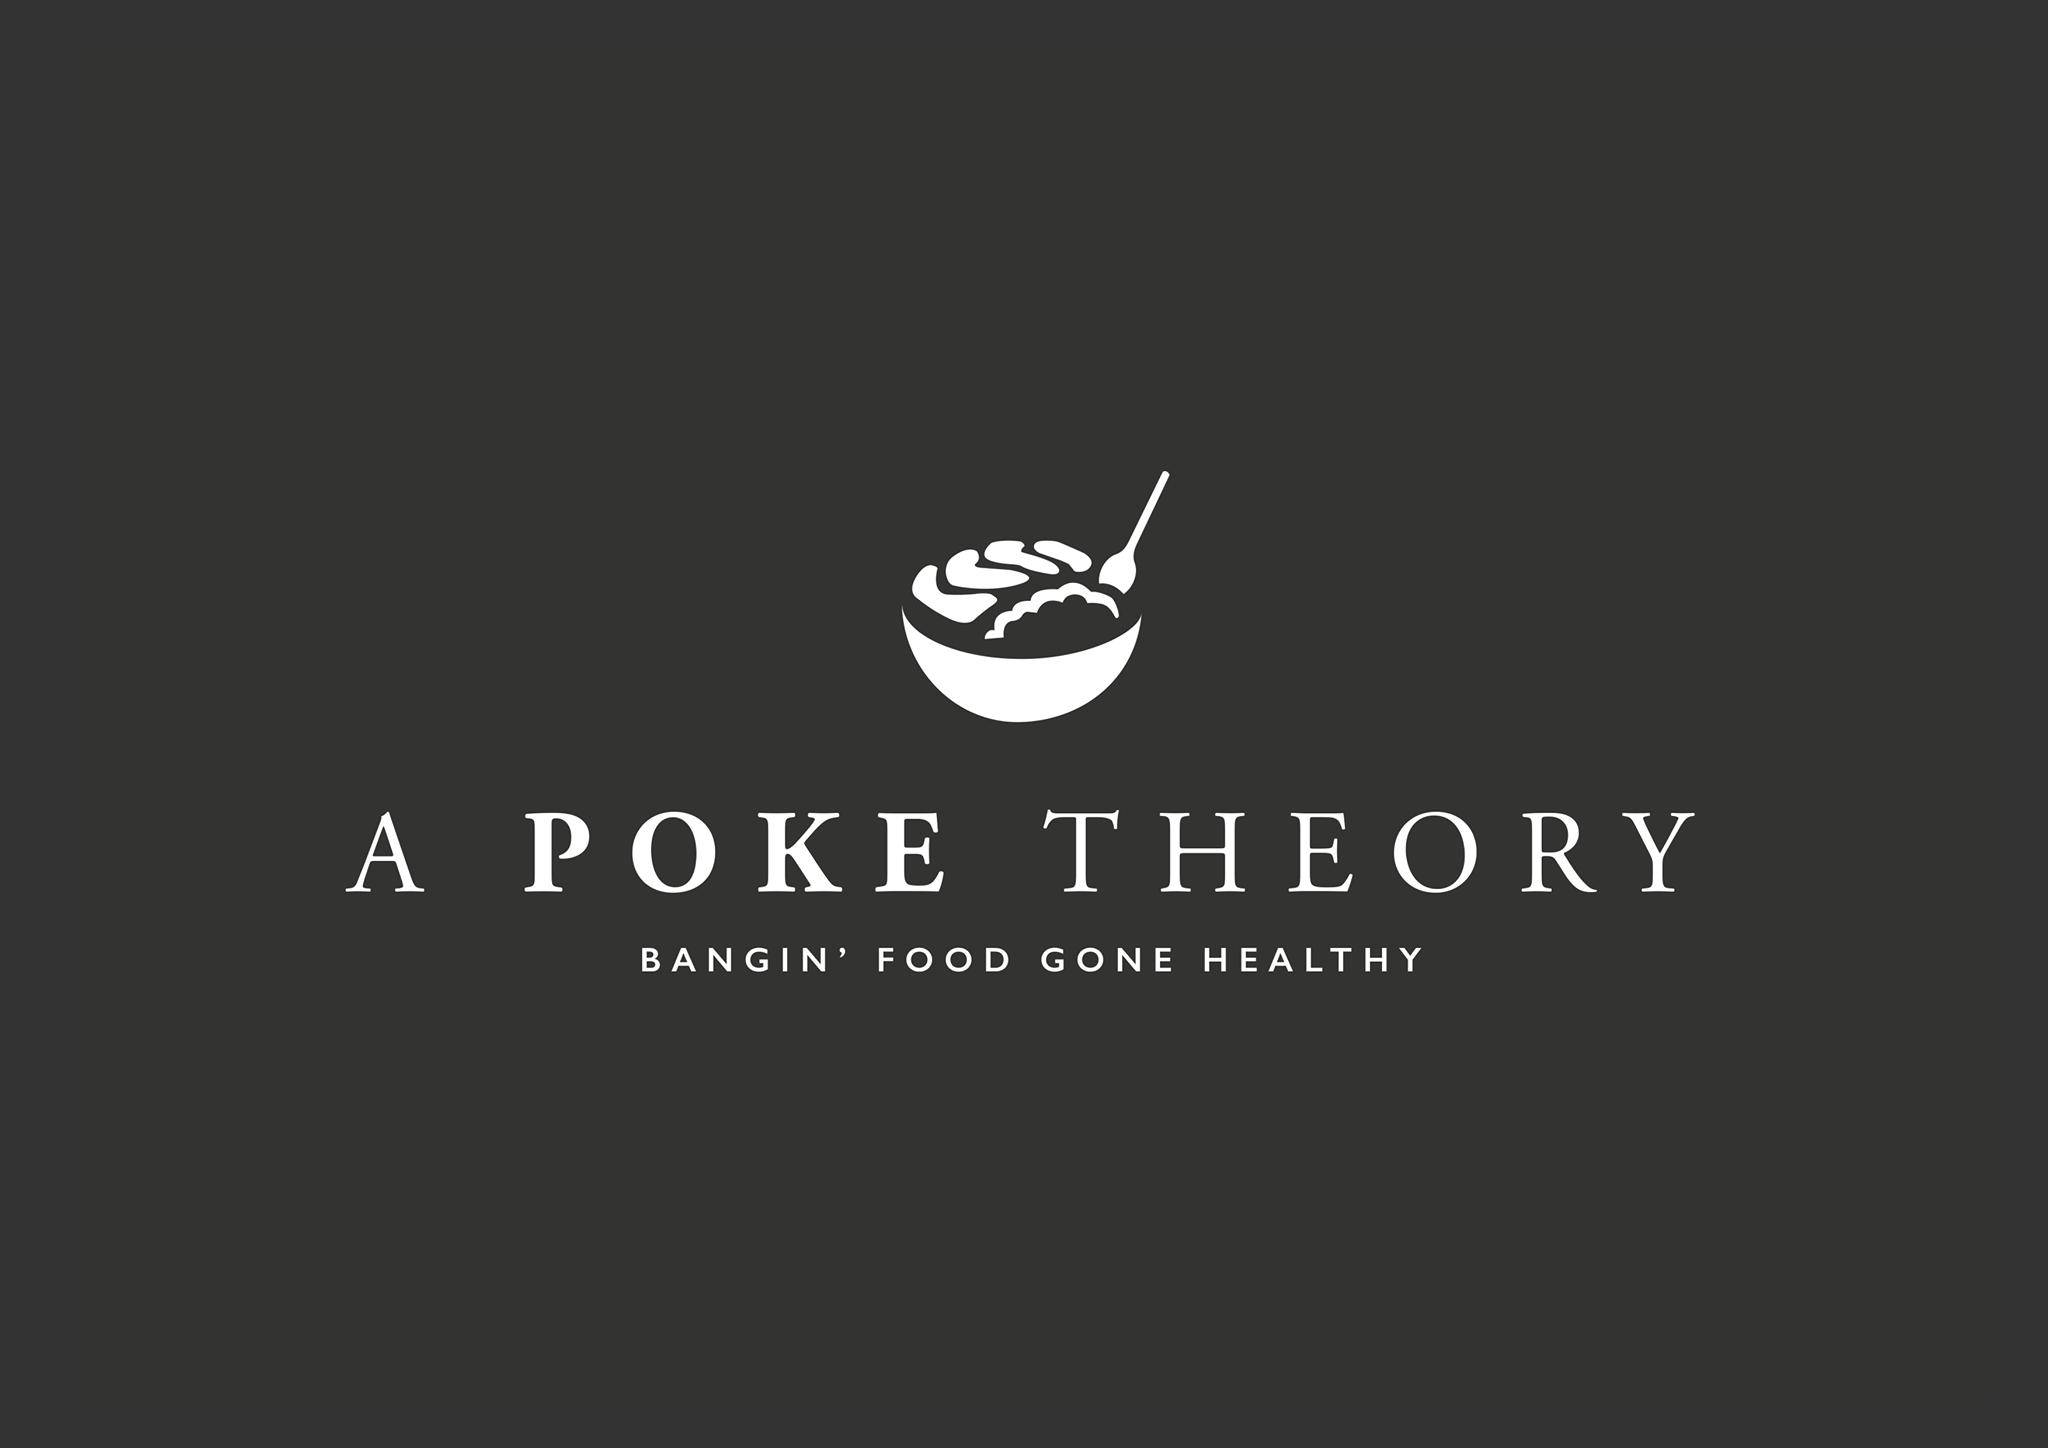 A Poke Theory (2016/2018)